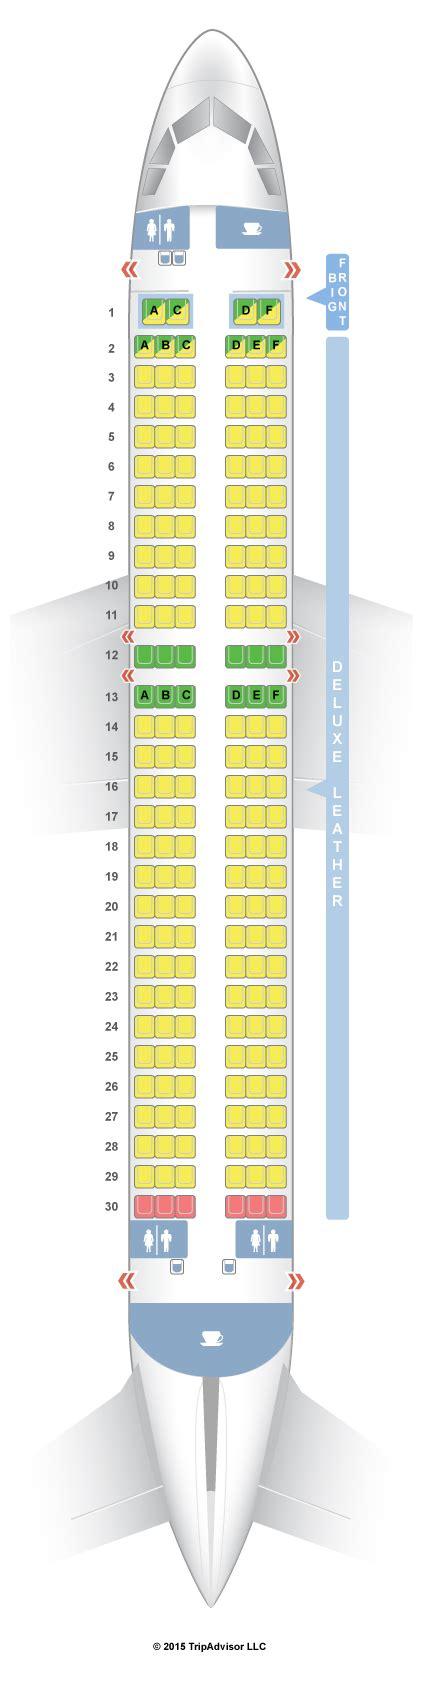 seatguru seat map spirit airbus a320 320 v1